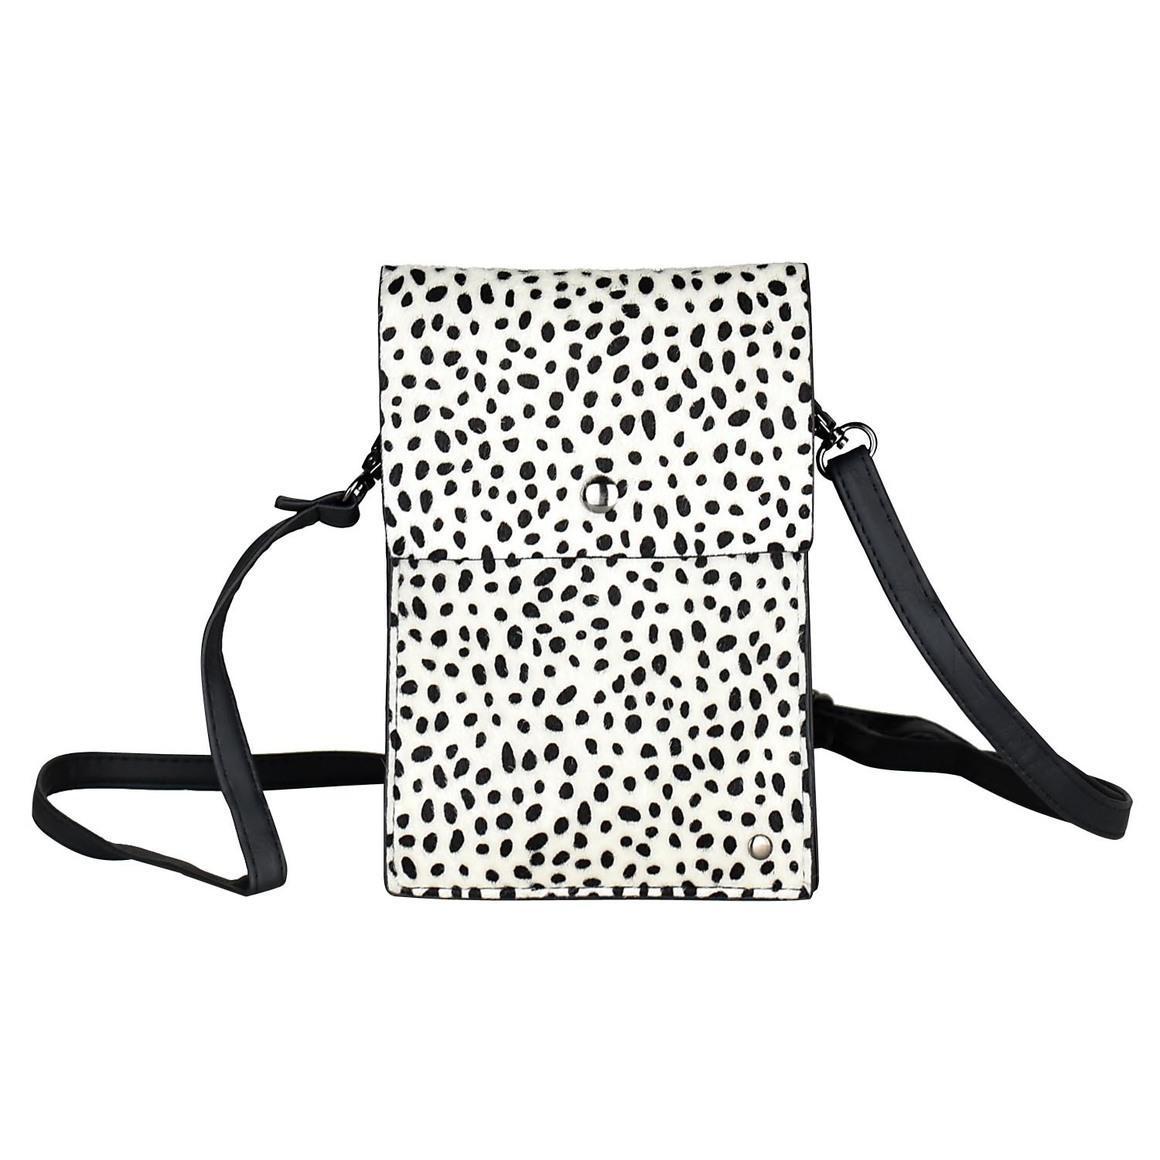 THSB1010: White: Animal Print Cross Bag | Trada Marketplace